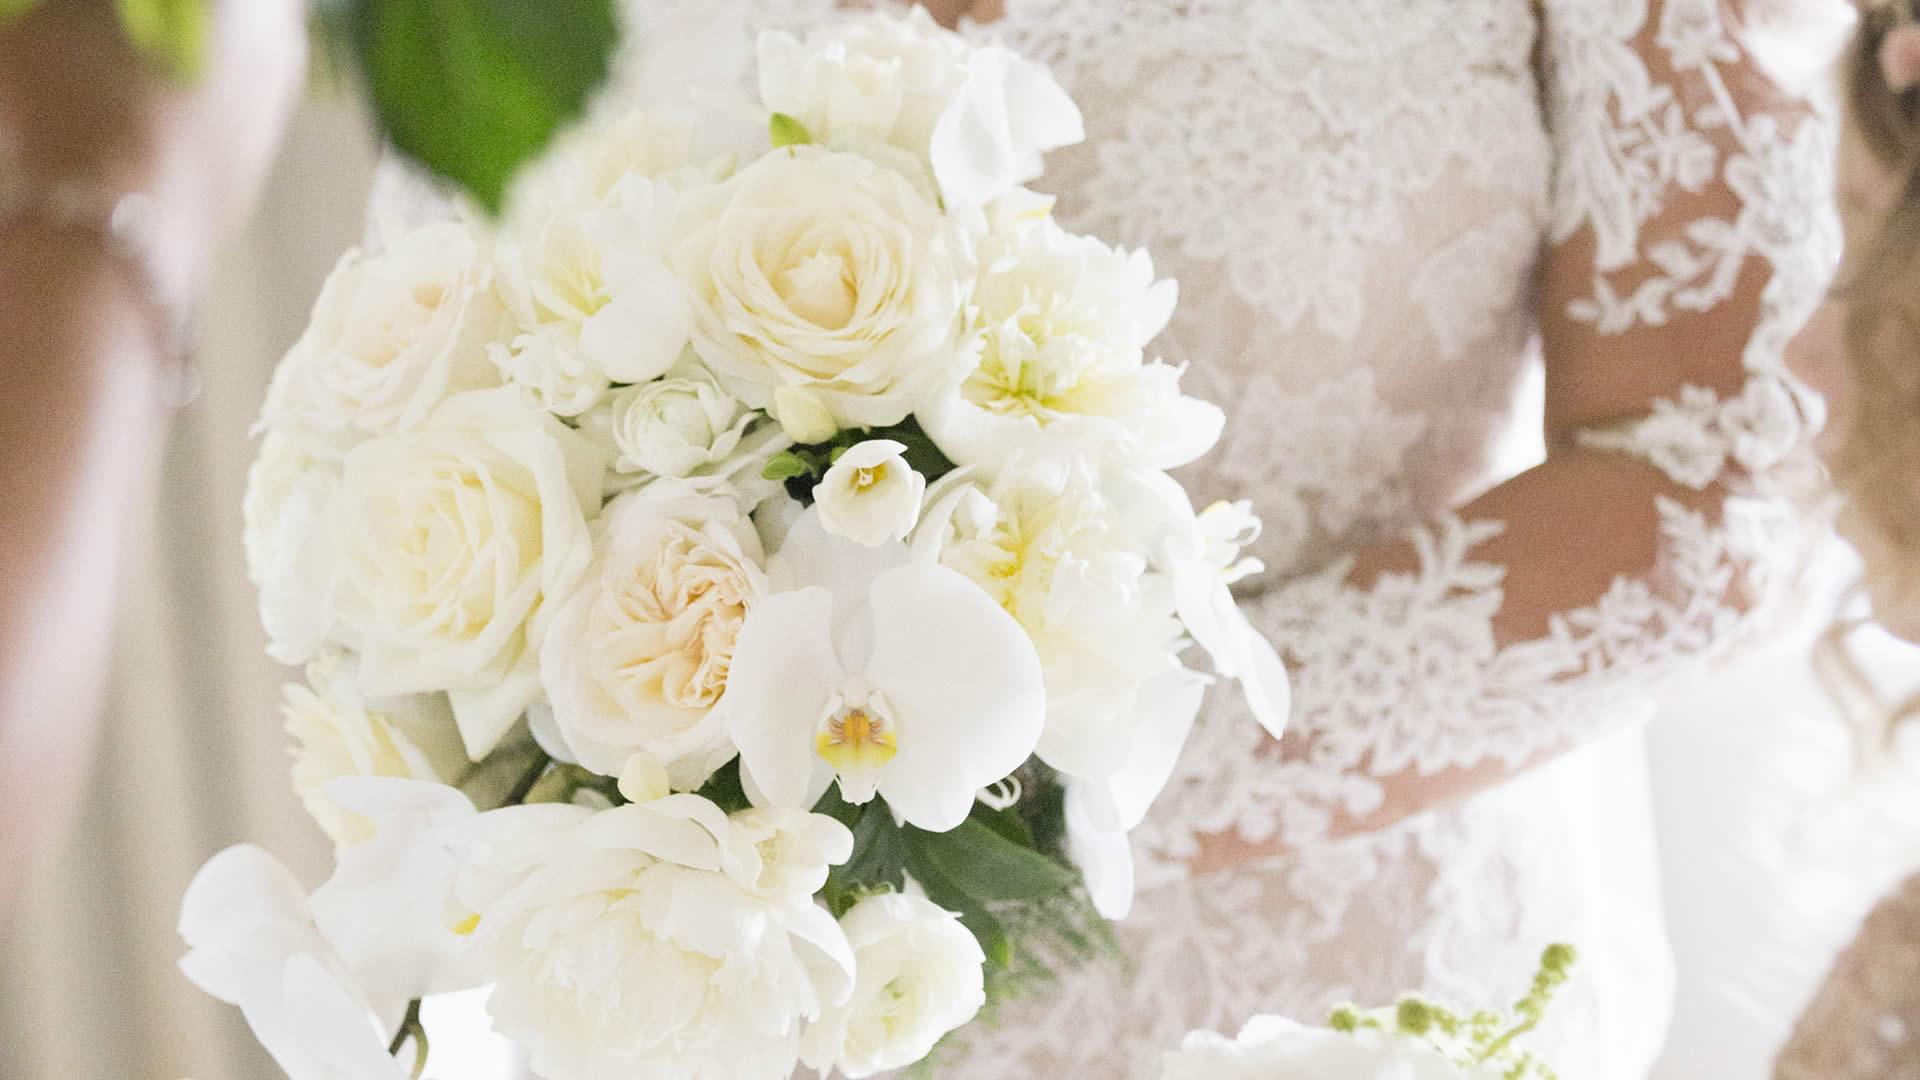 Danielle & Chris - Flourish Flowers, Weddings